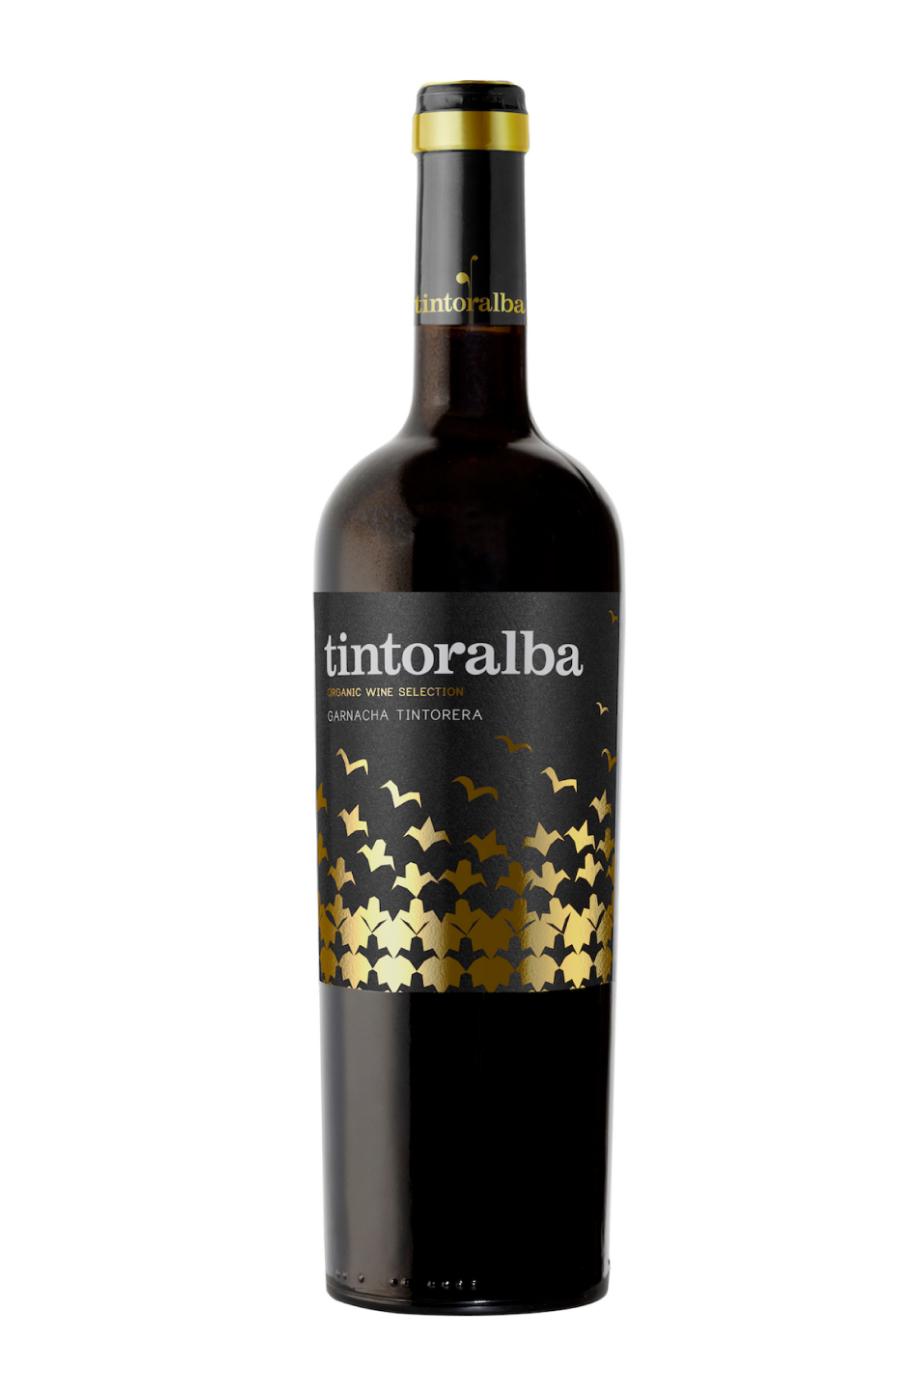 Tintoralba Ecologico Seleccion | Tintoralba - Winexfood